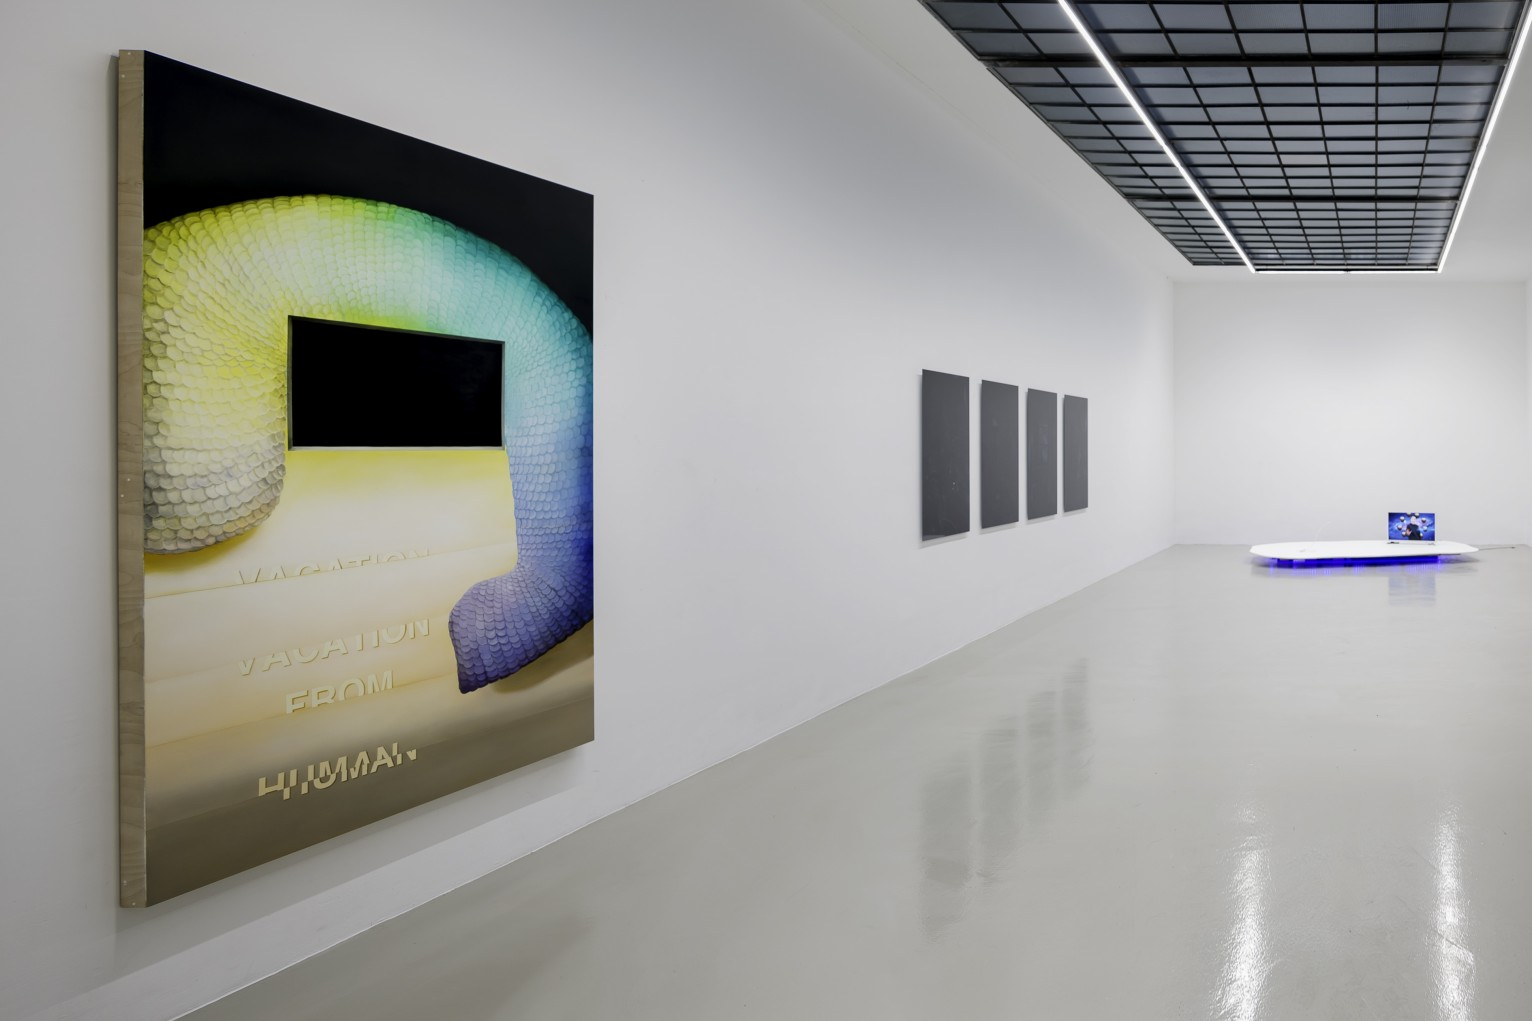 Stranger Days  curated by Jürgen Dehm  Malte Bruns | Benedikt Hipp | Lindsay Lawson | Pascual Sisto | Julia Weissenberg  16 Feb - 19 Mar 2017